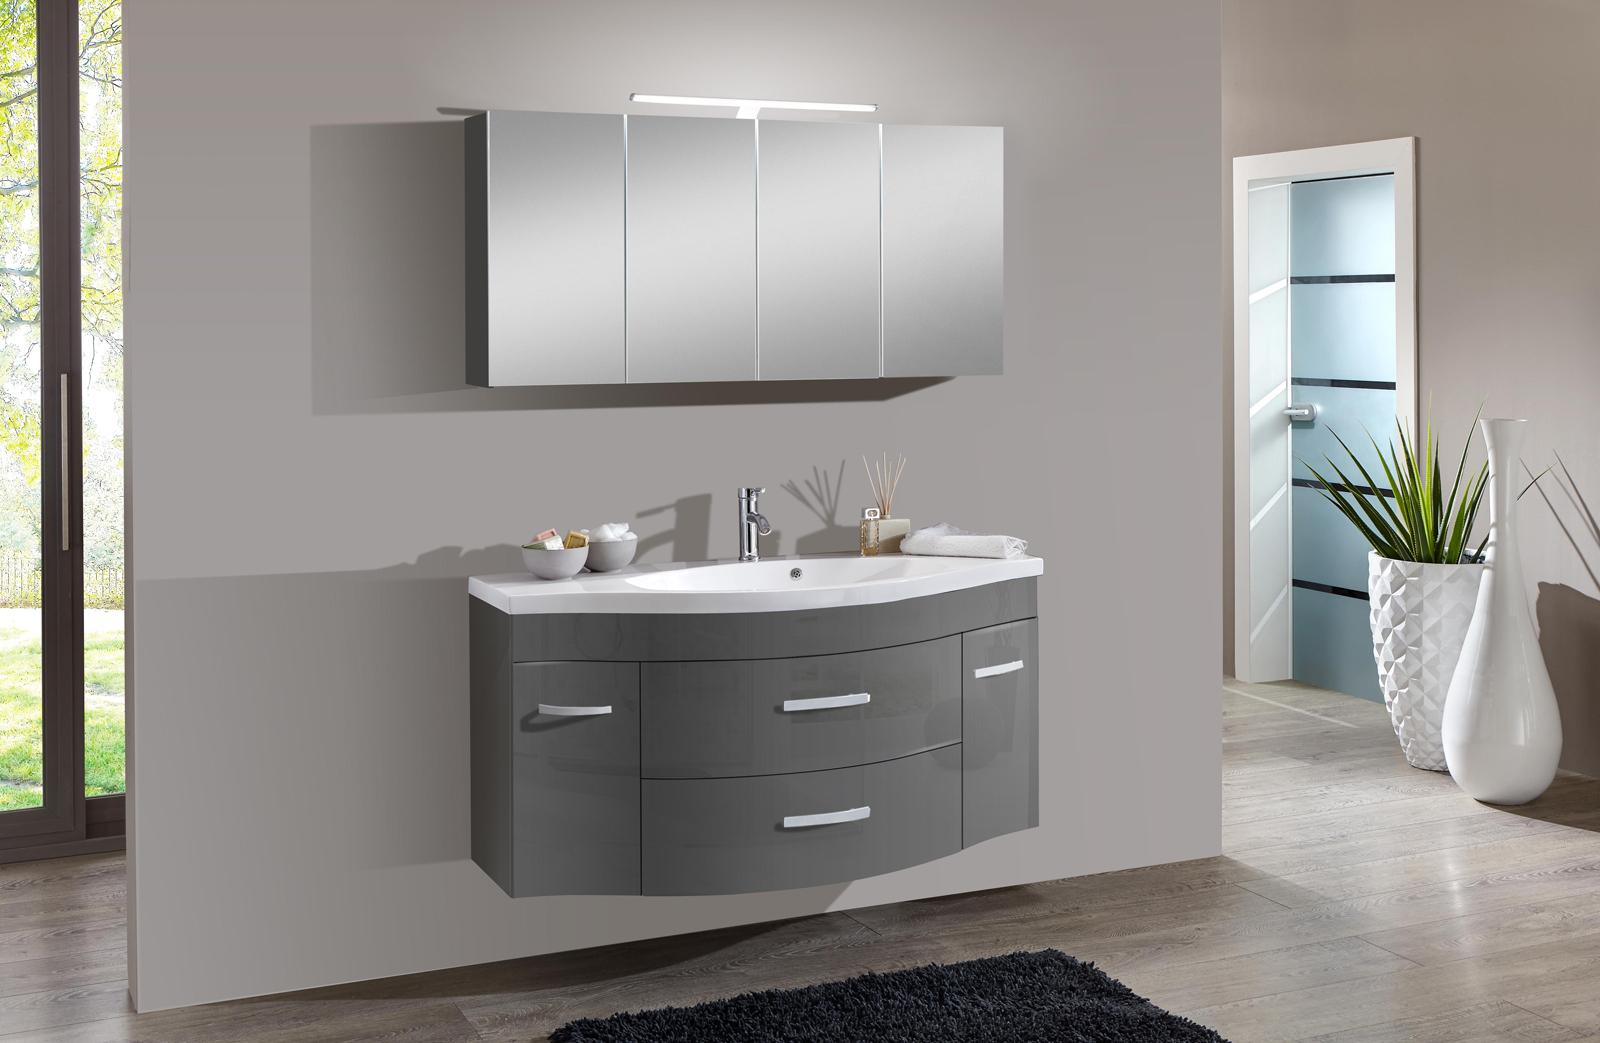 sam 2tlg badezimmer set hochglanz grau 130cm lugano. Black Bedroom Furniture Sets. Home Design Ideas